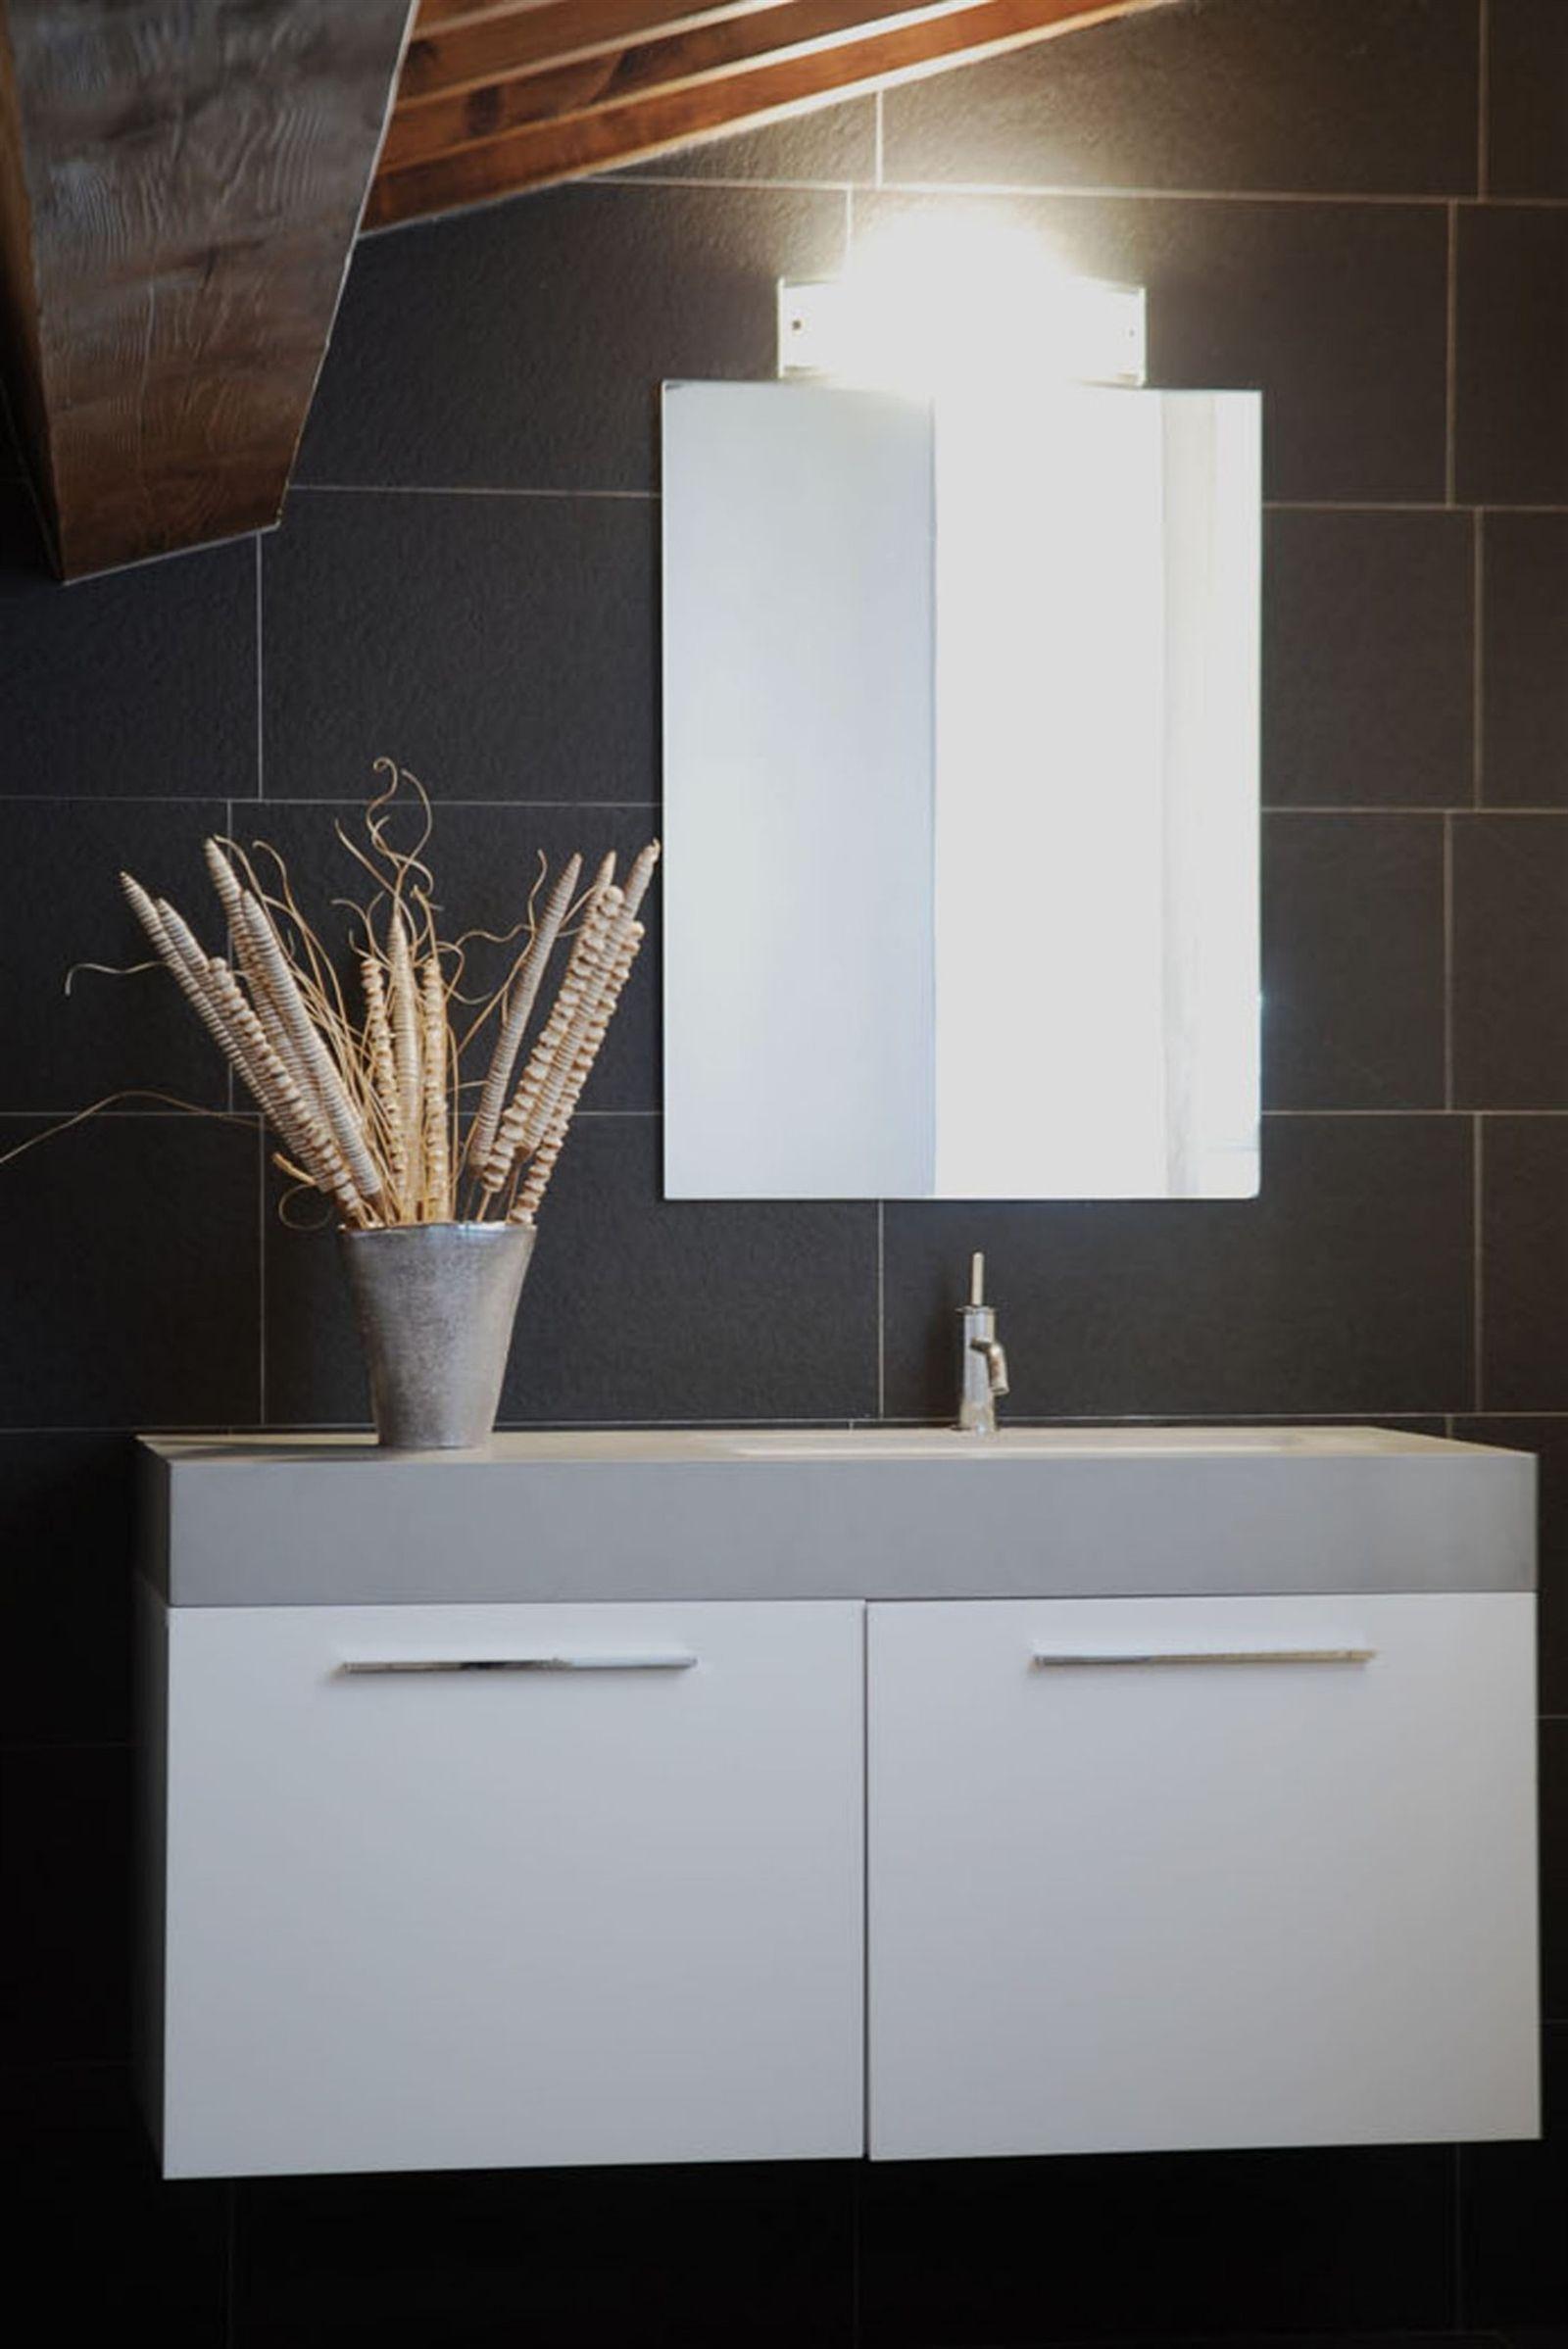 OPERASTUDIO - Project - Interior renovation - #Tuscany #villa #bathroom